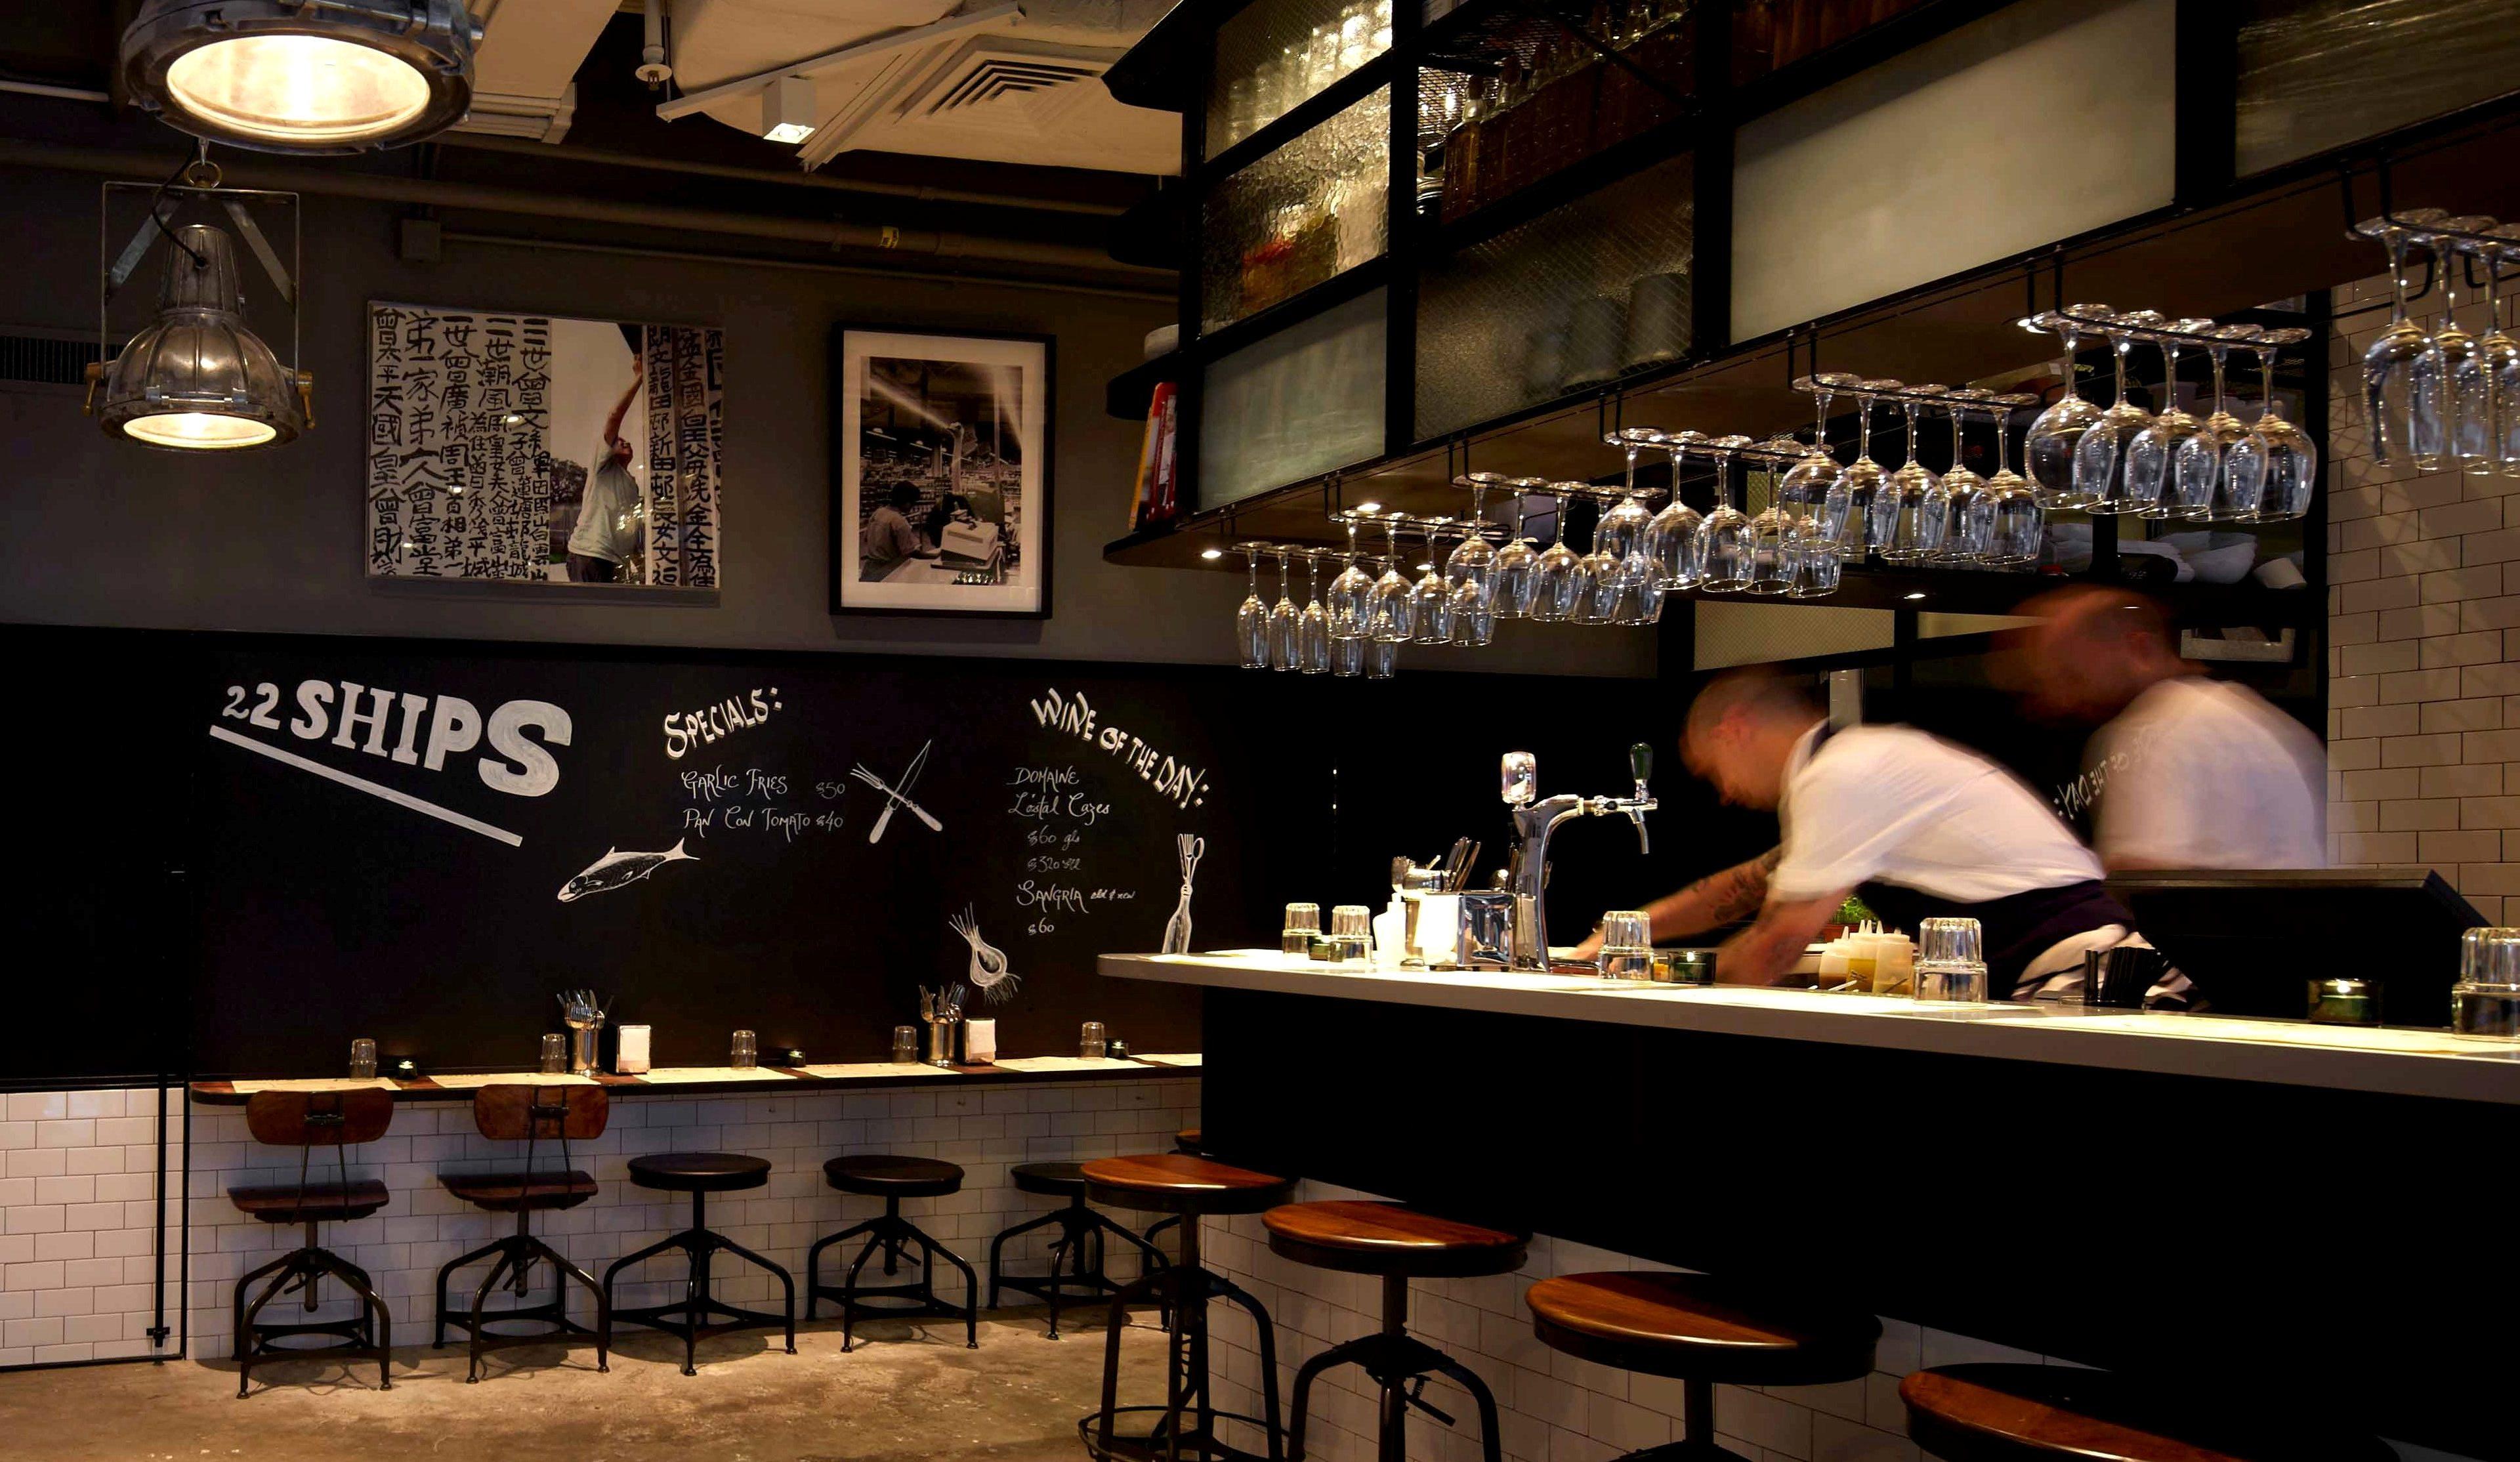 西班牙 Tapas 酒吧 22 ships。